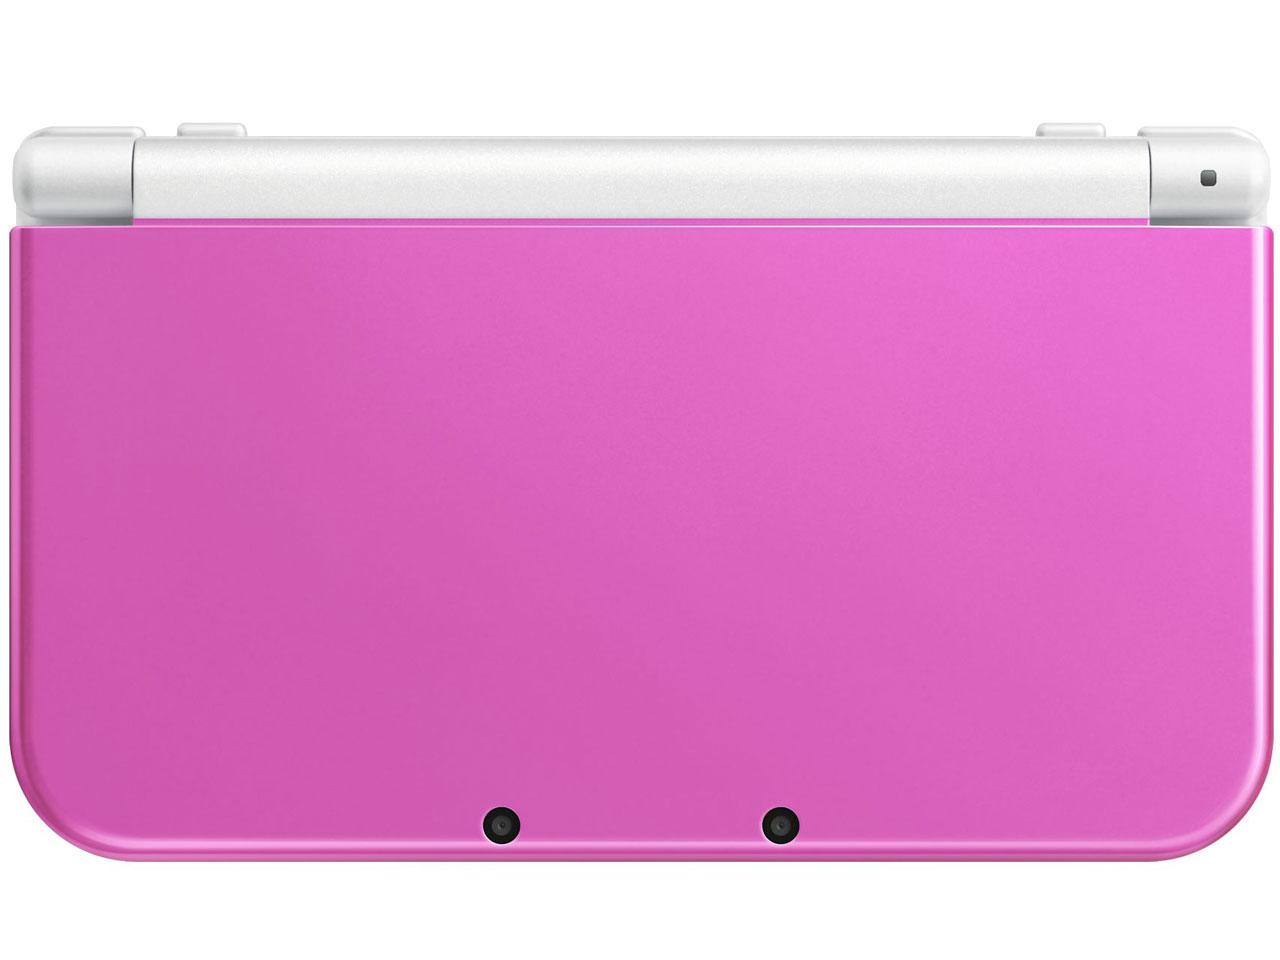 Newニンテンドー3DS LL ピンク×ホワイト